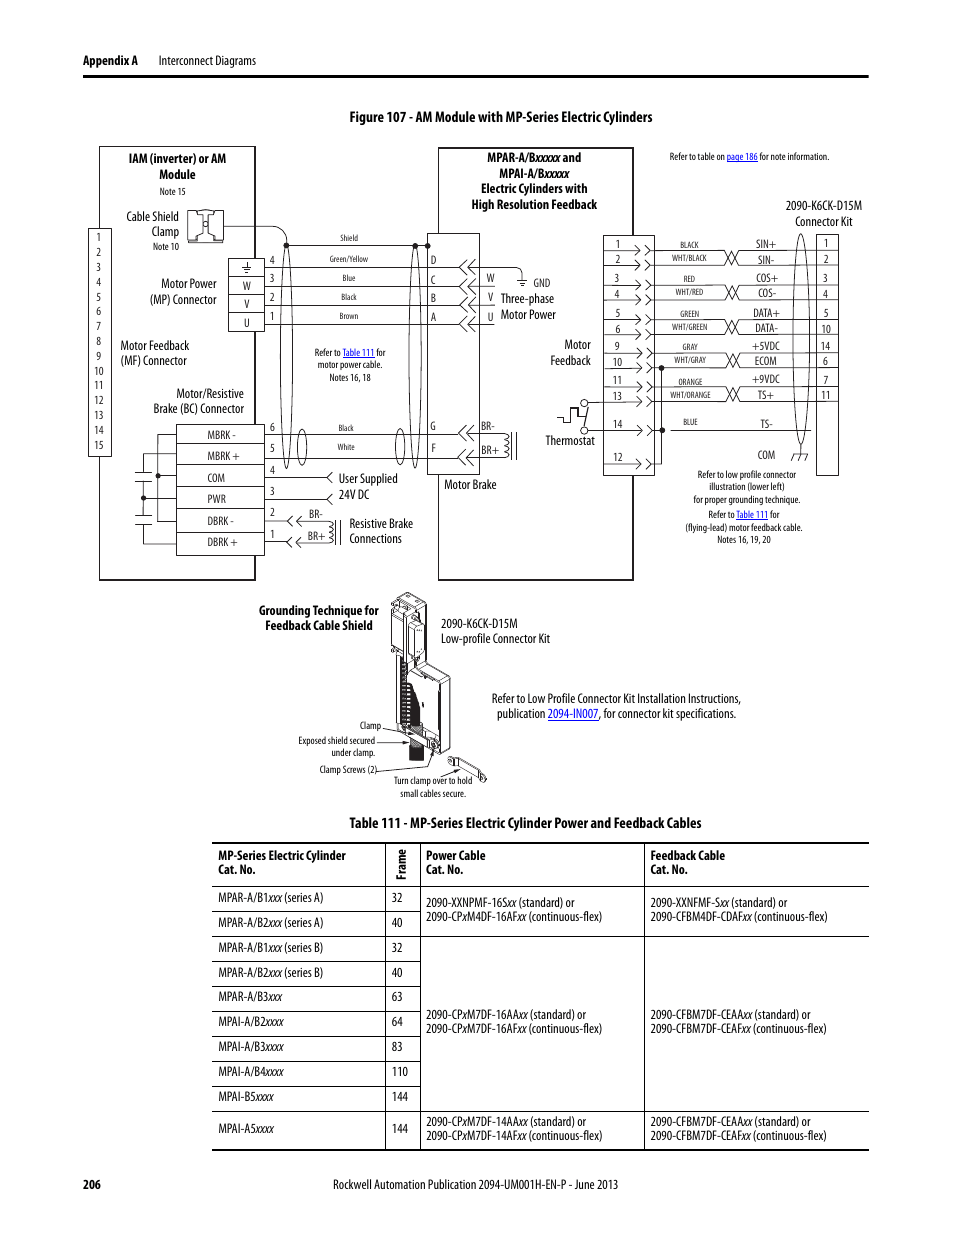 Rockwell Automation 2094-xMxx-S Kinetix 6000 Multi-axis